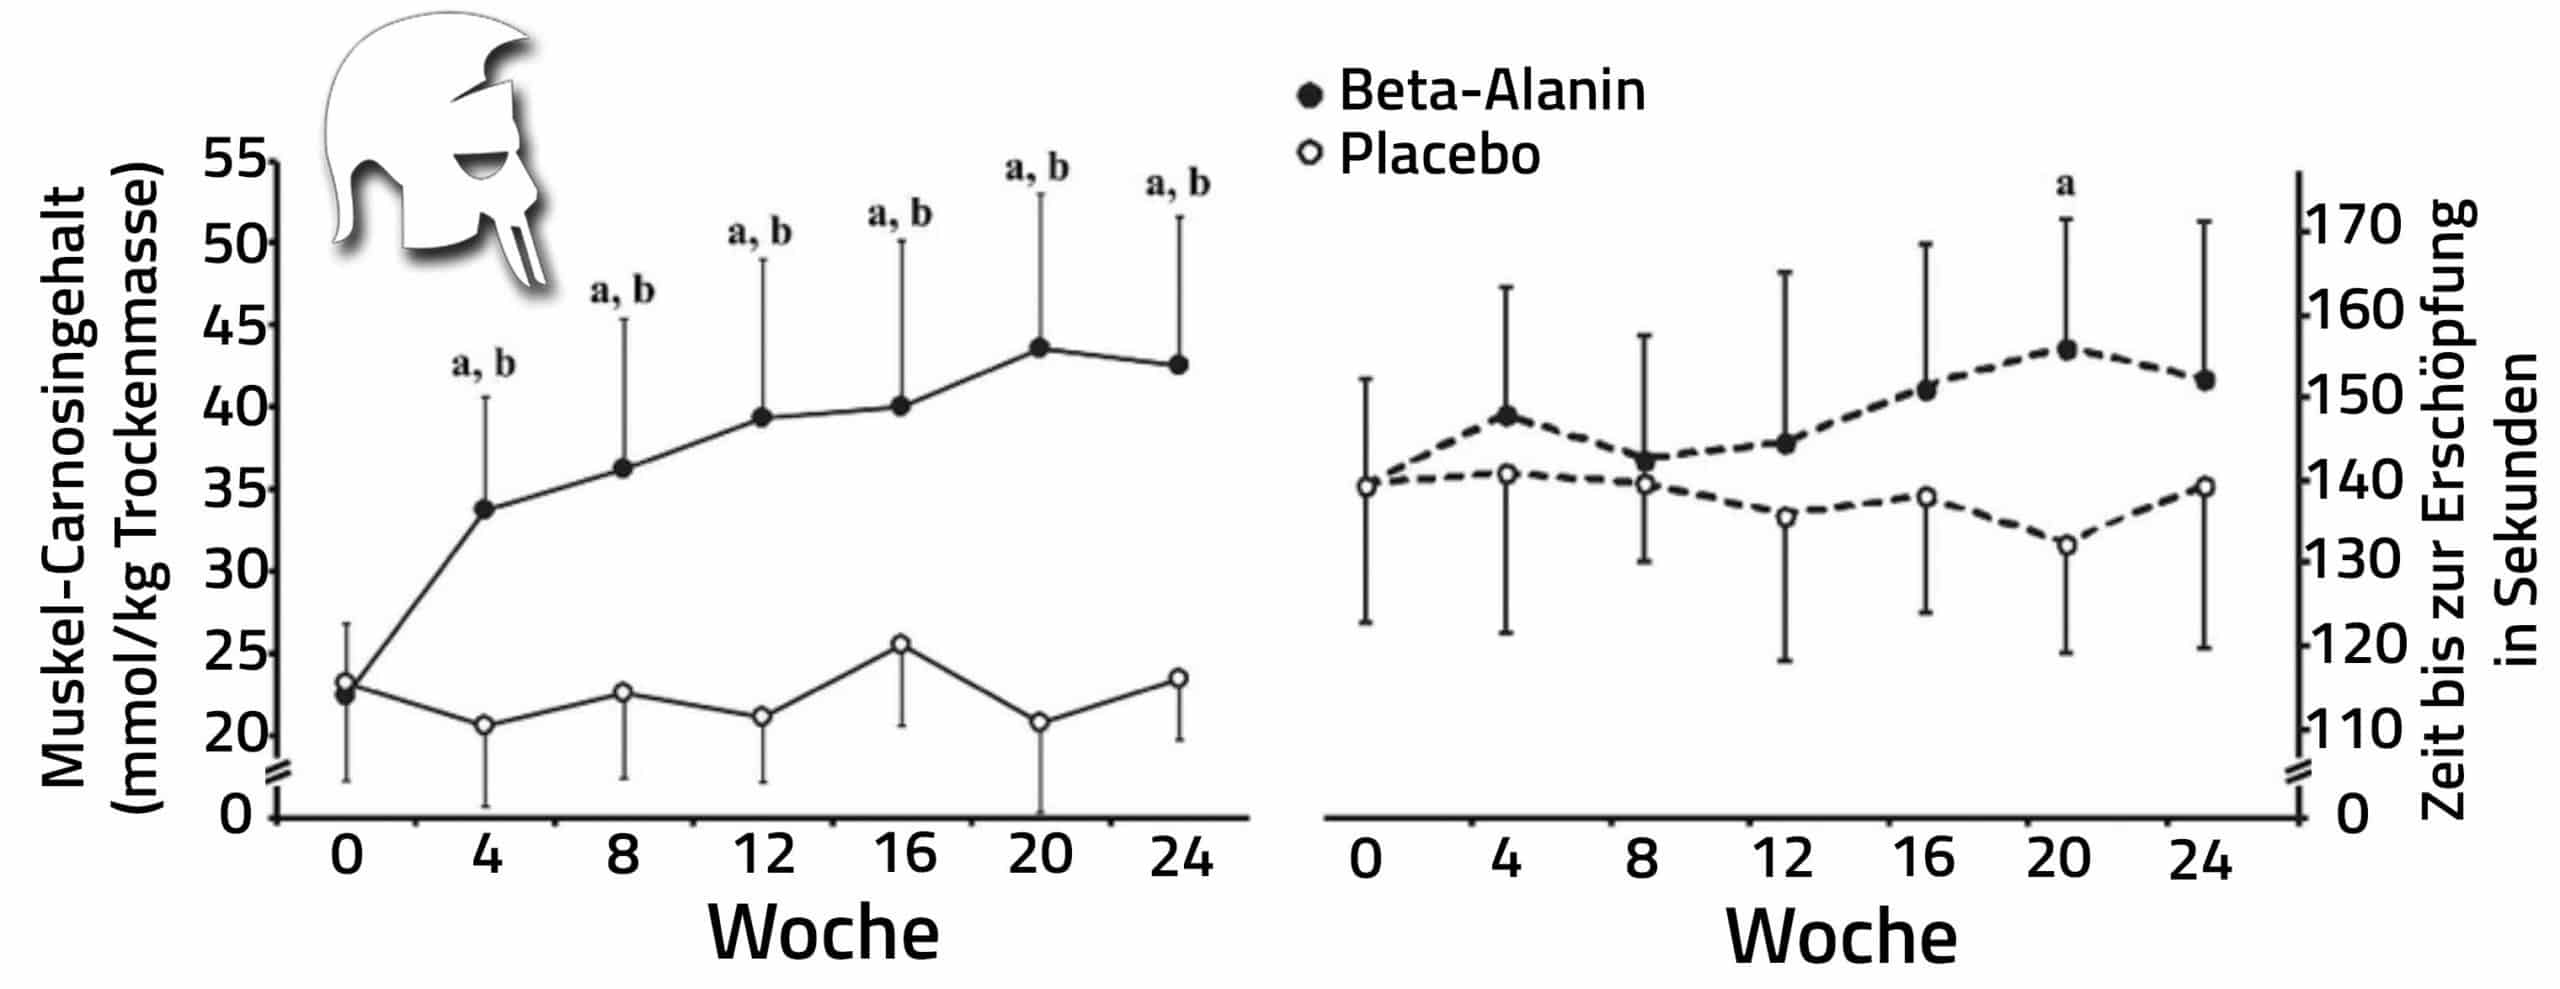 Dosierung Beta-Alanin